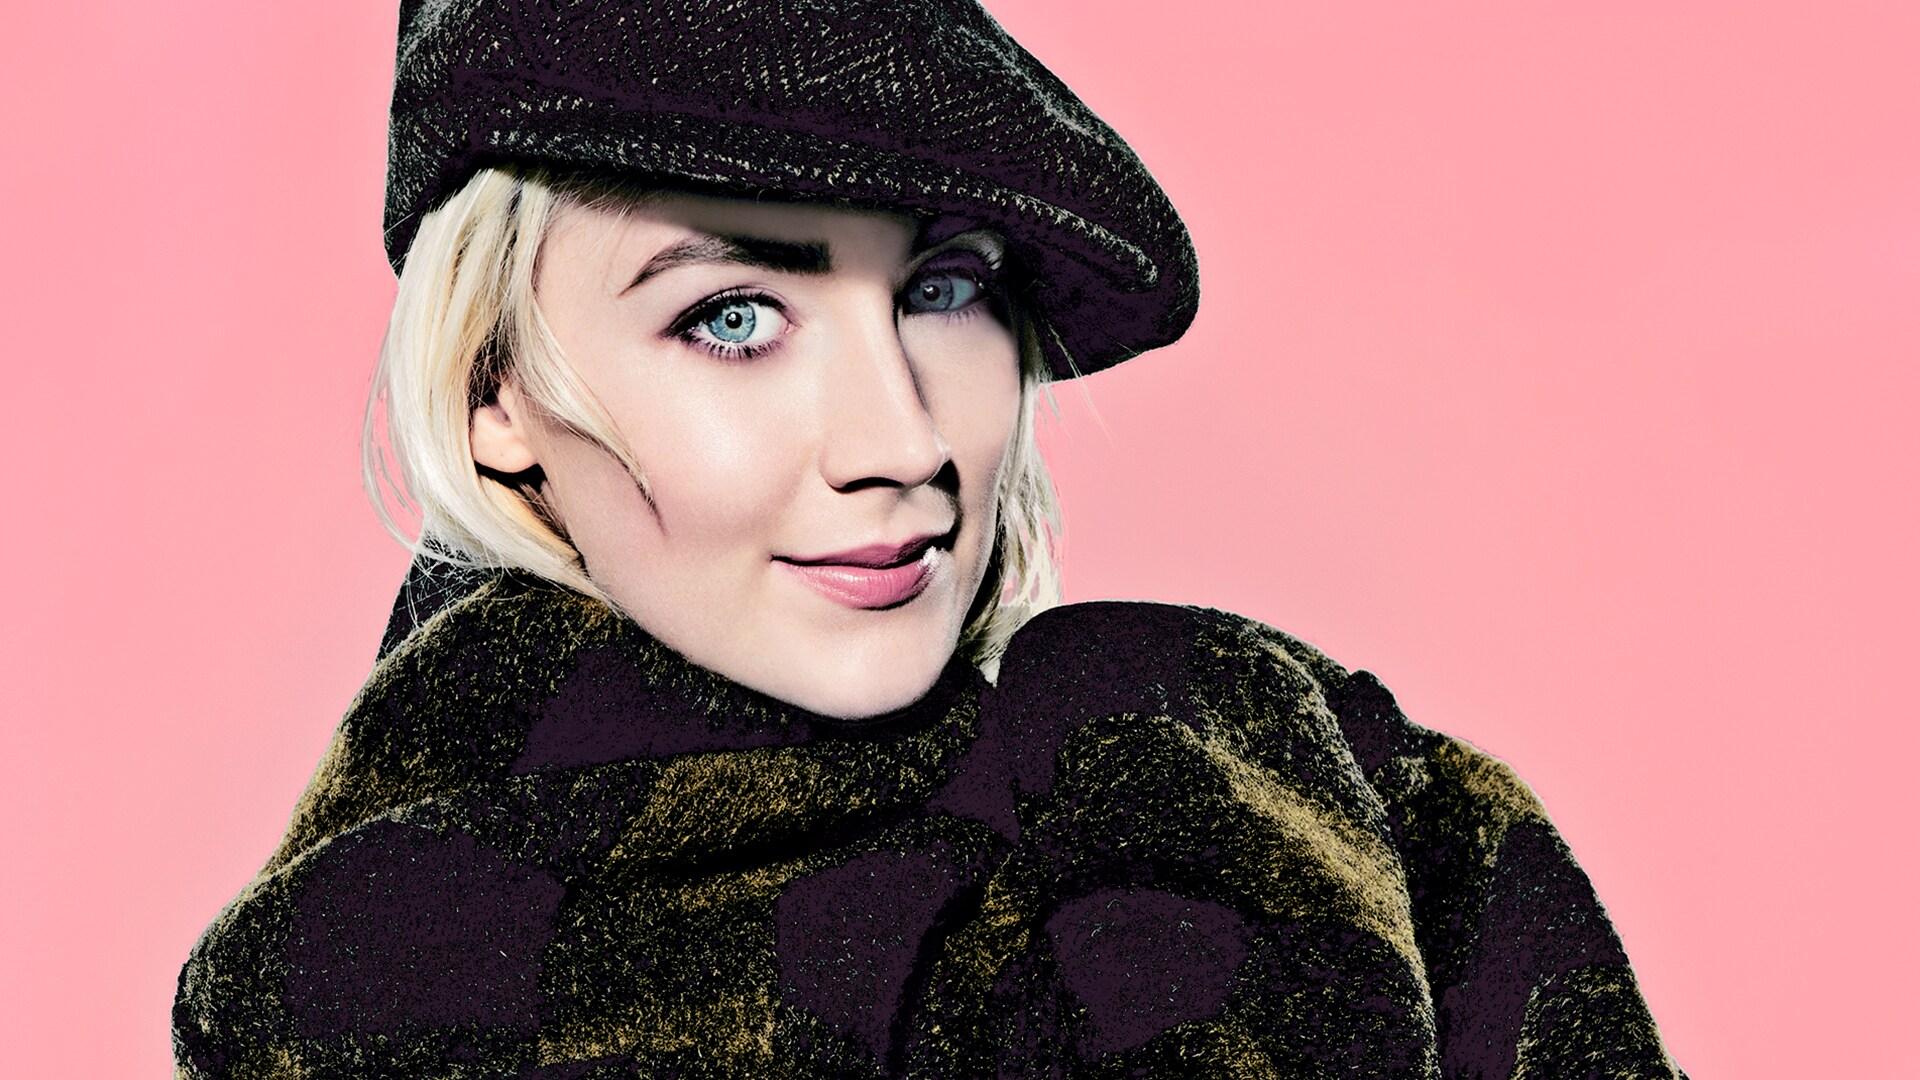 Saoirse Ronan: December 2, 2017